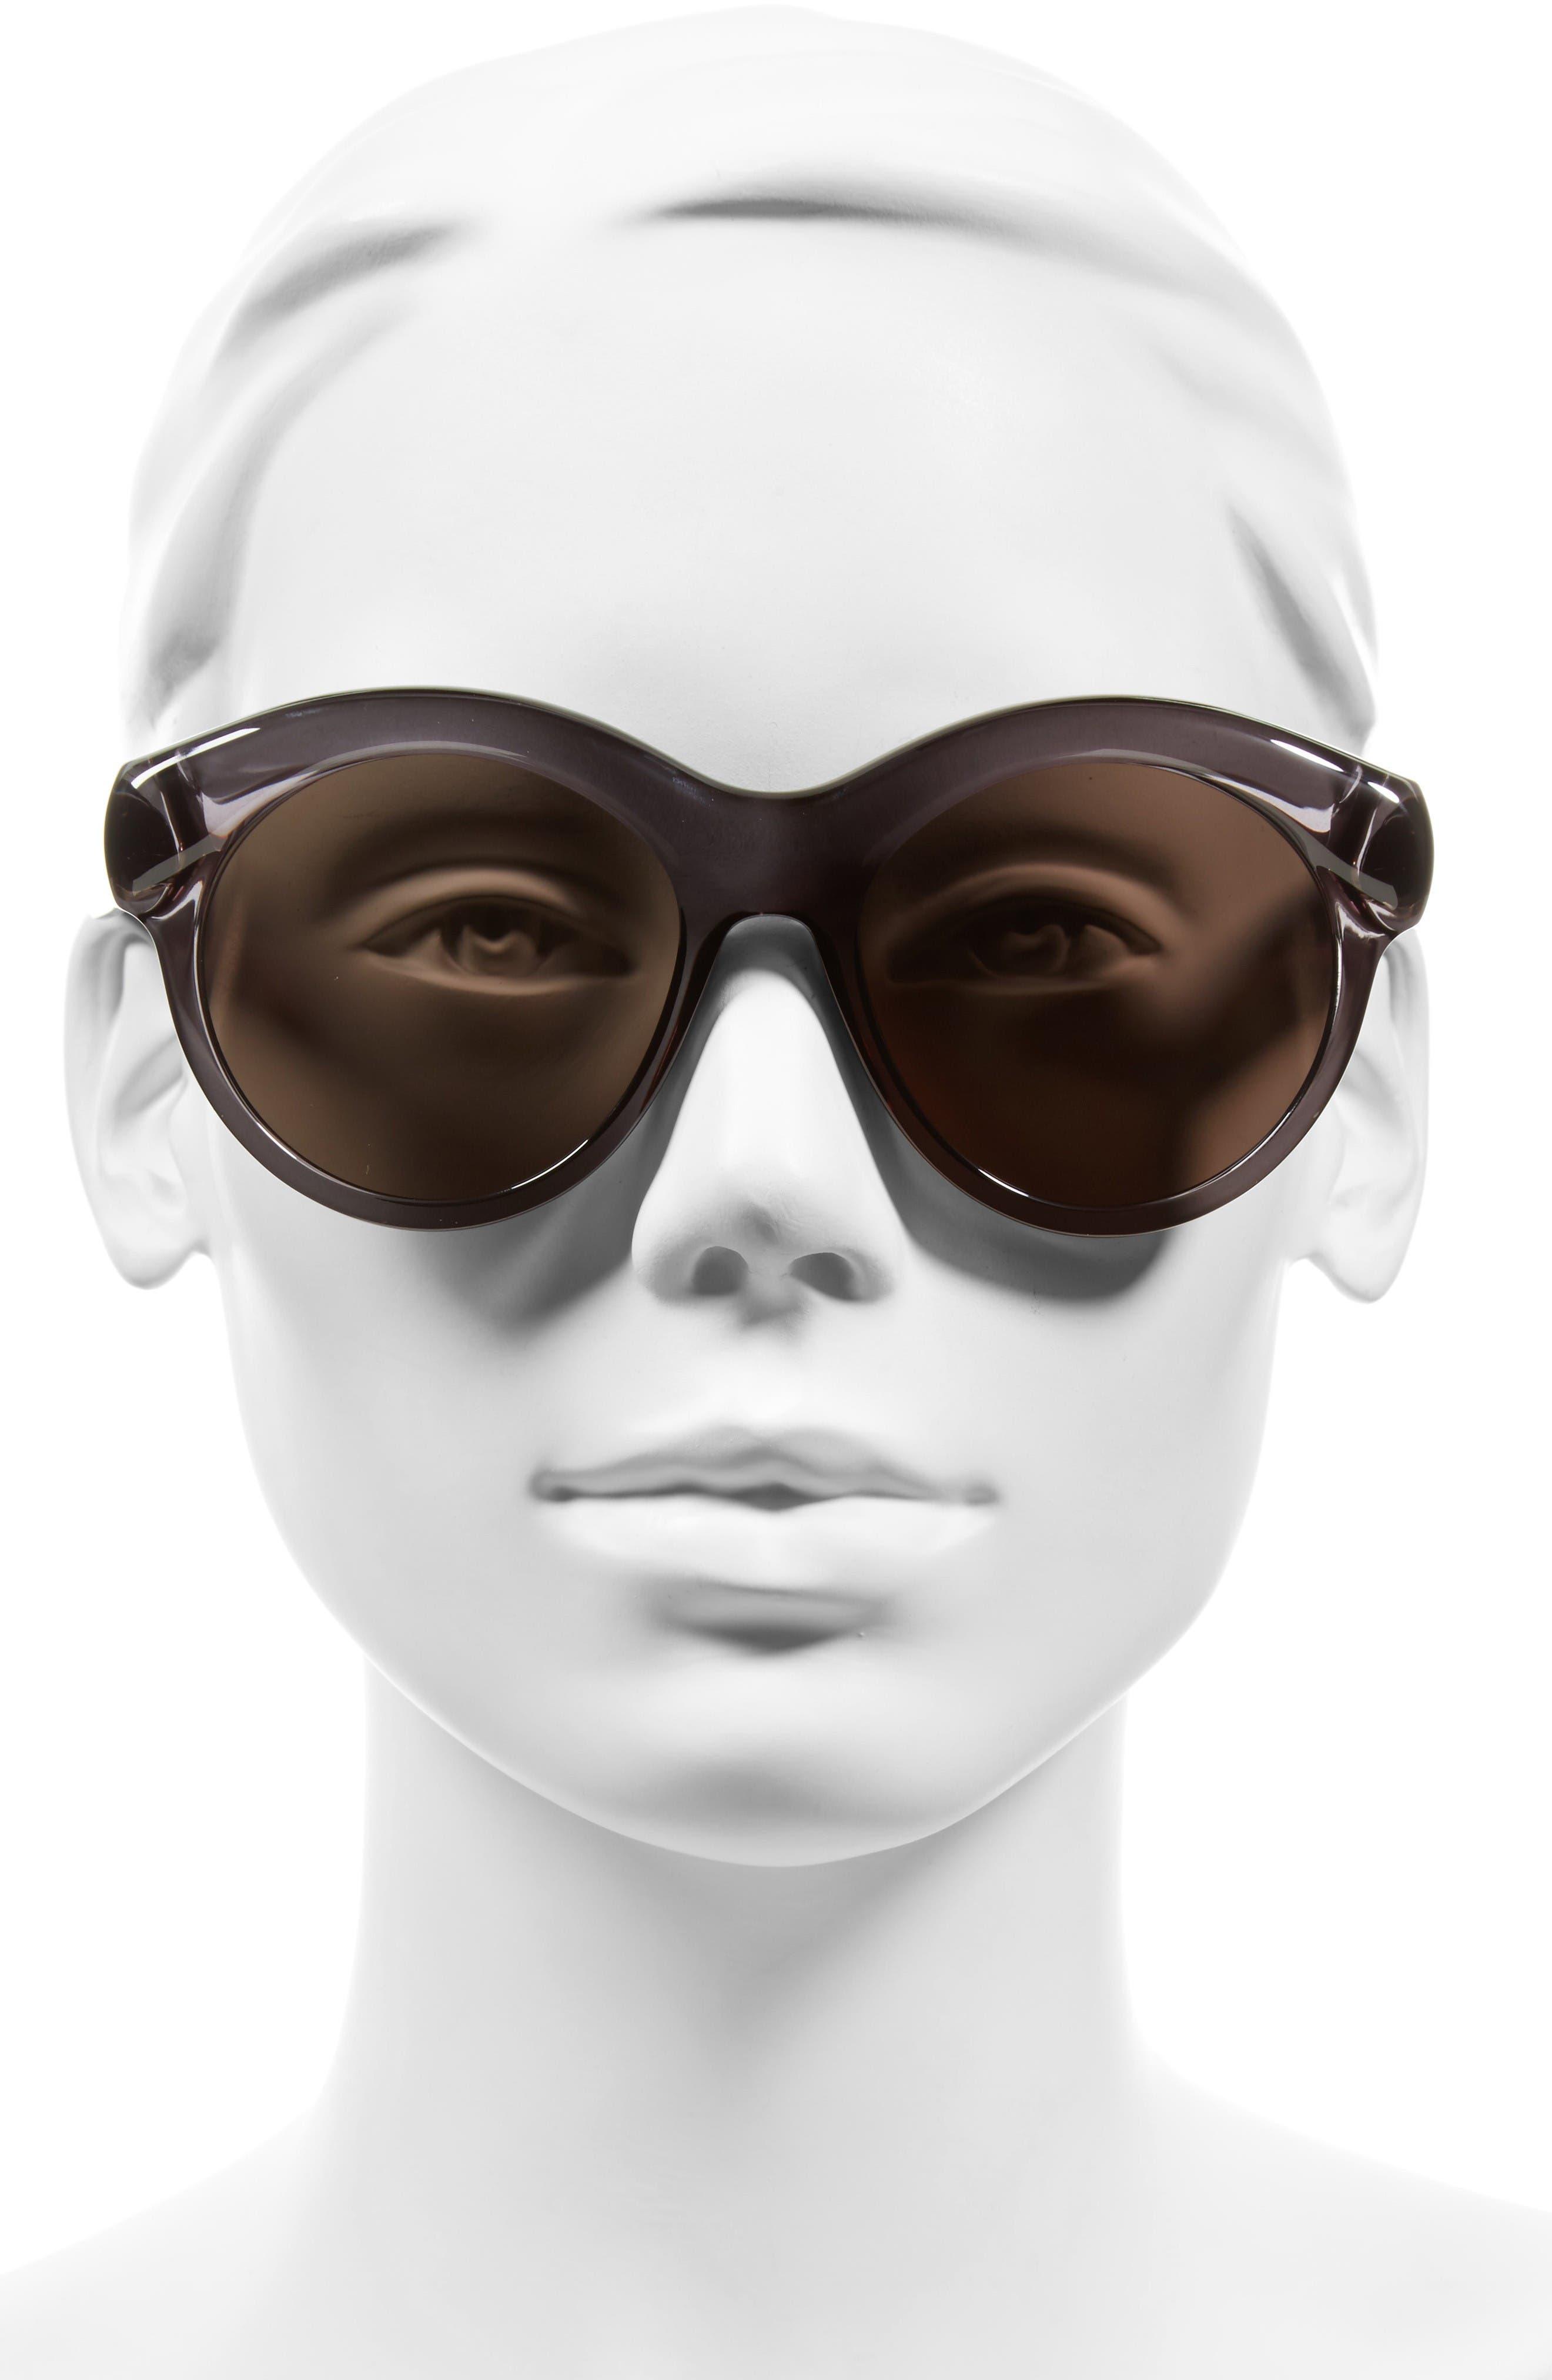 54mm Sunglasses,                             Alternate thumbnail 3, color,                             020